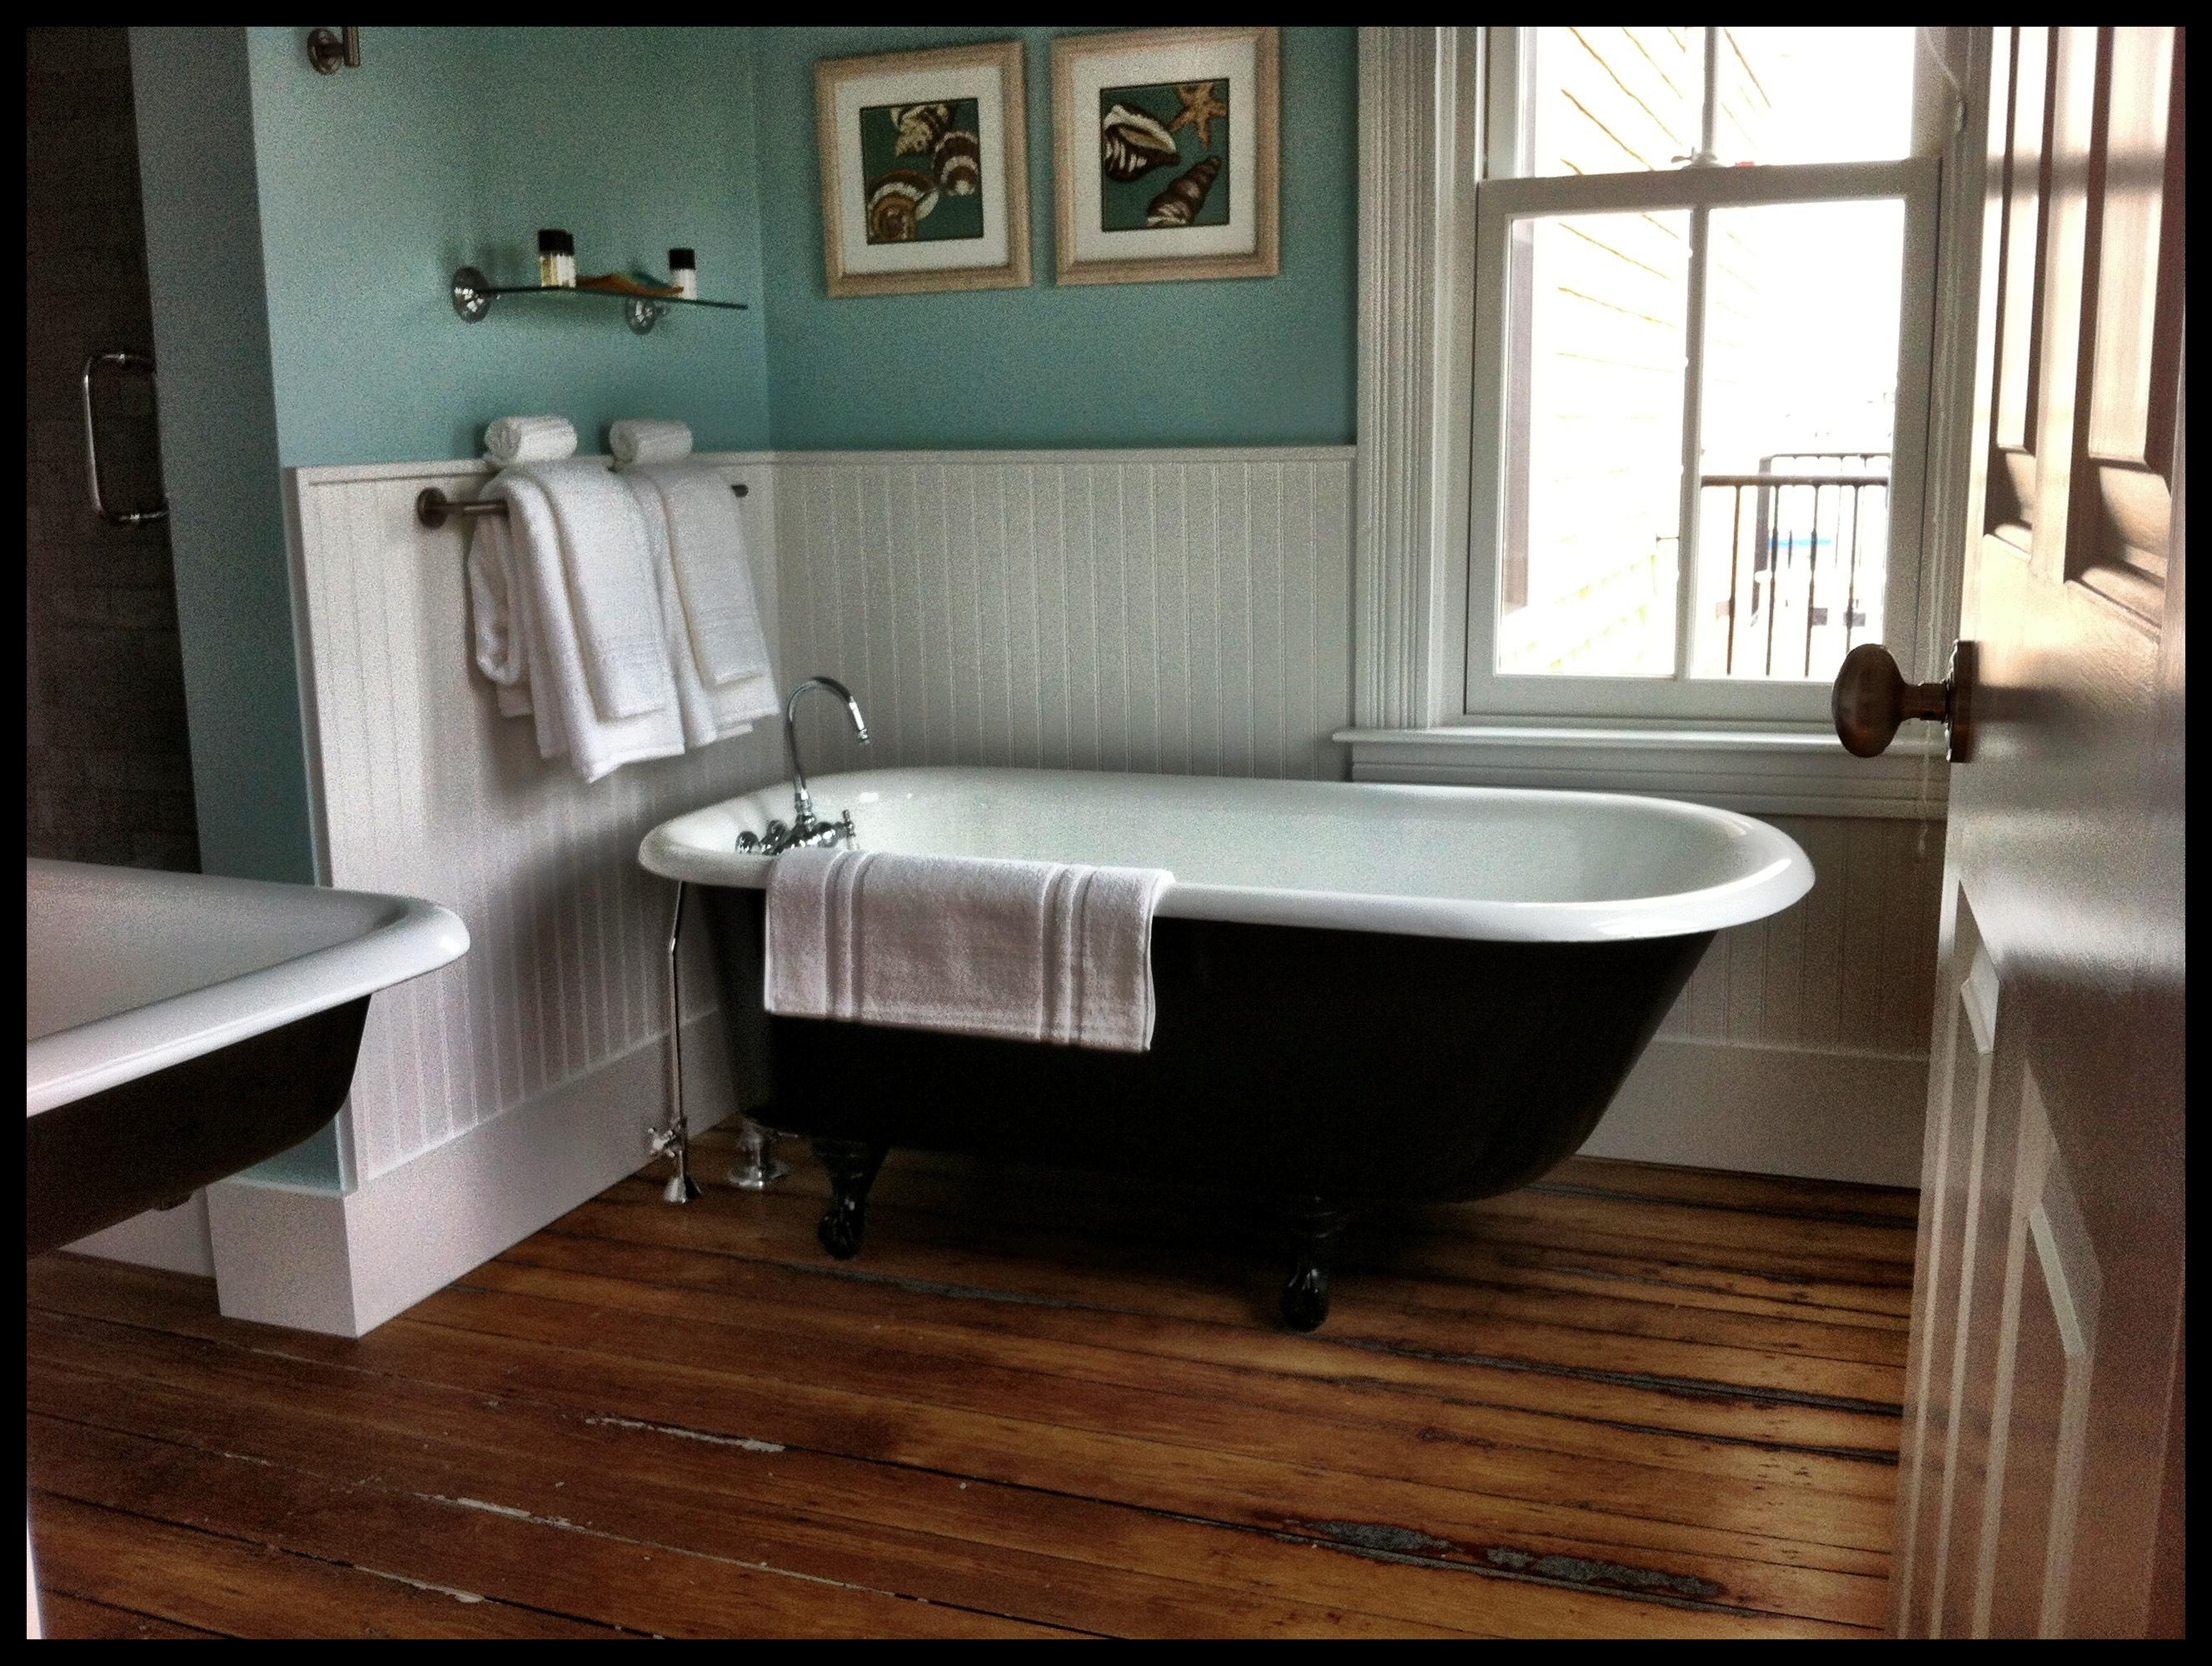 The ultimate Cape Cod bathtub, at the Woods Hole Inn.